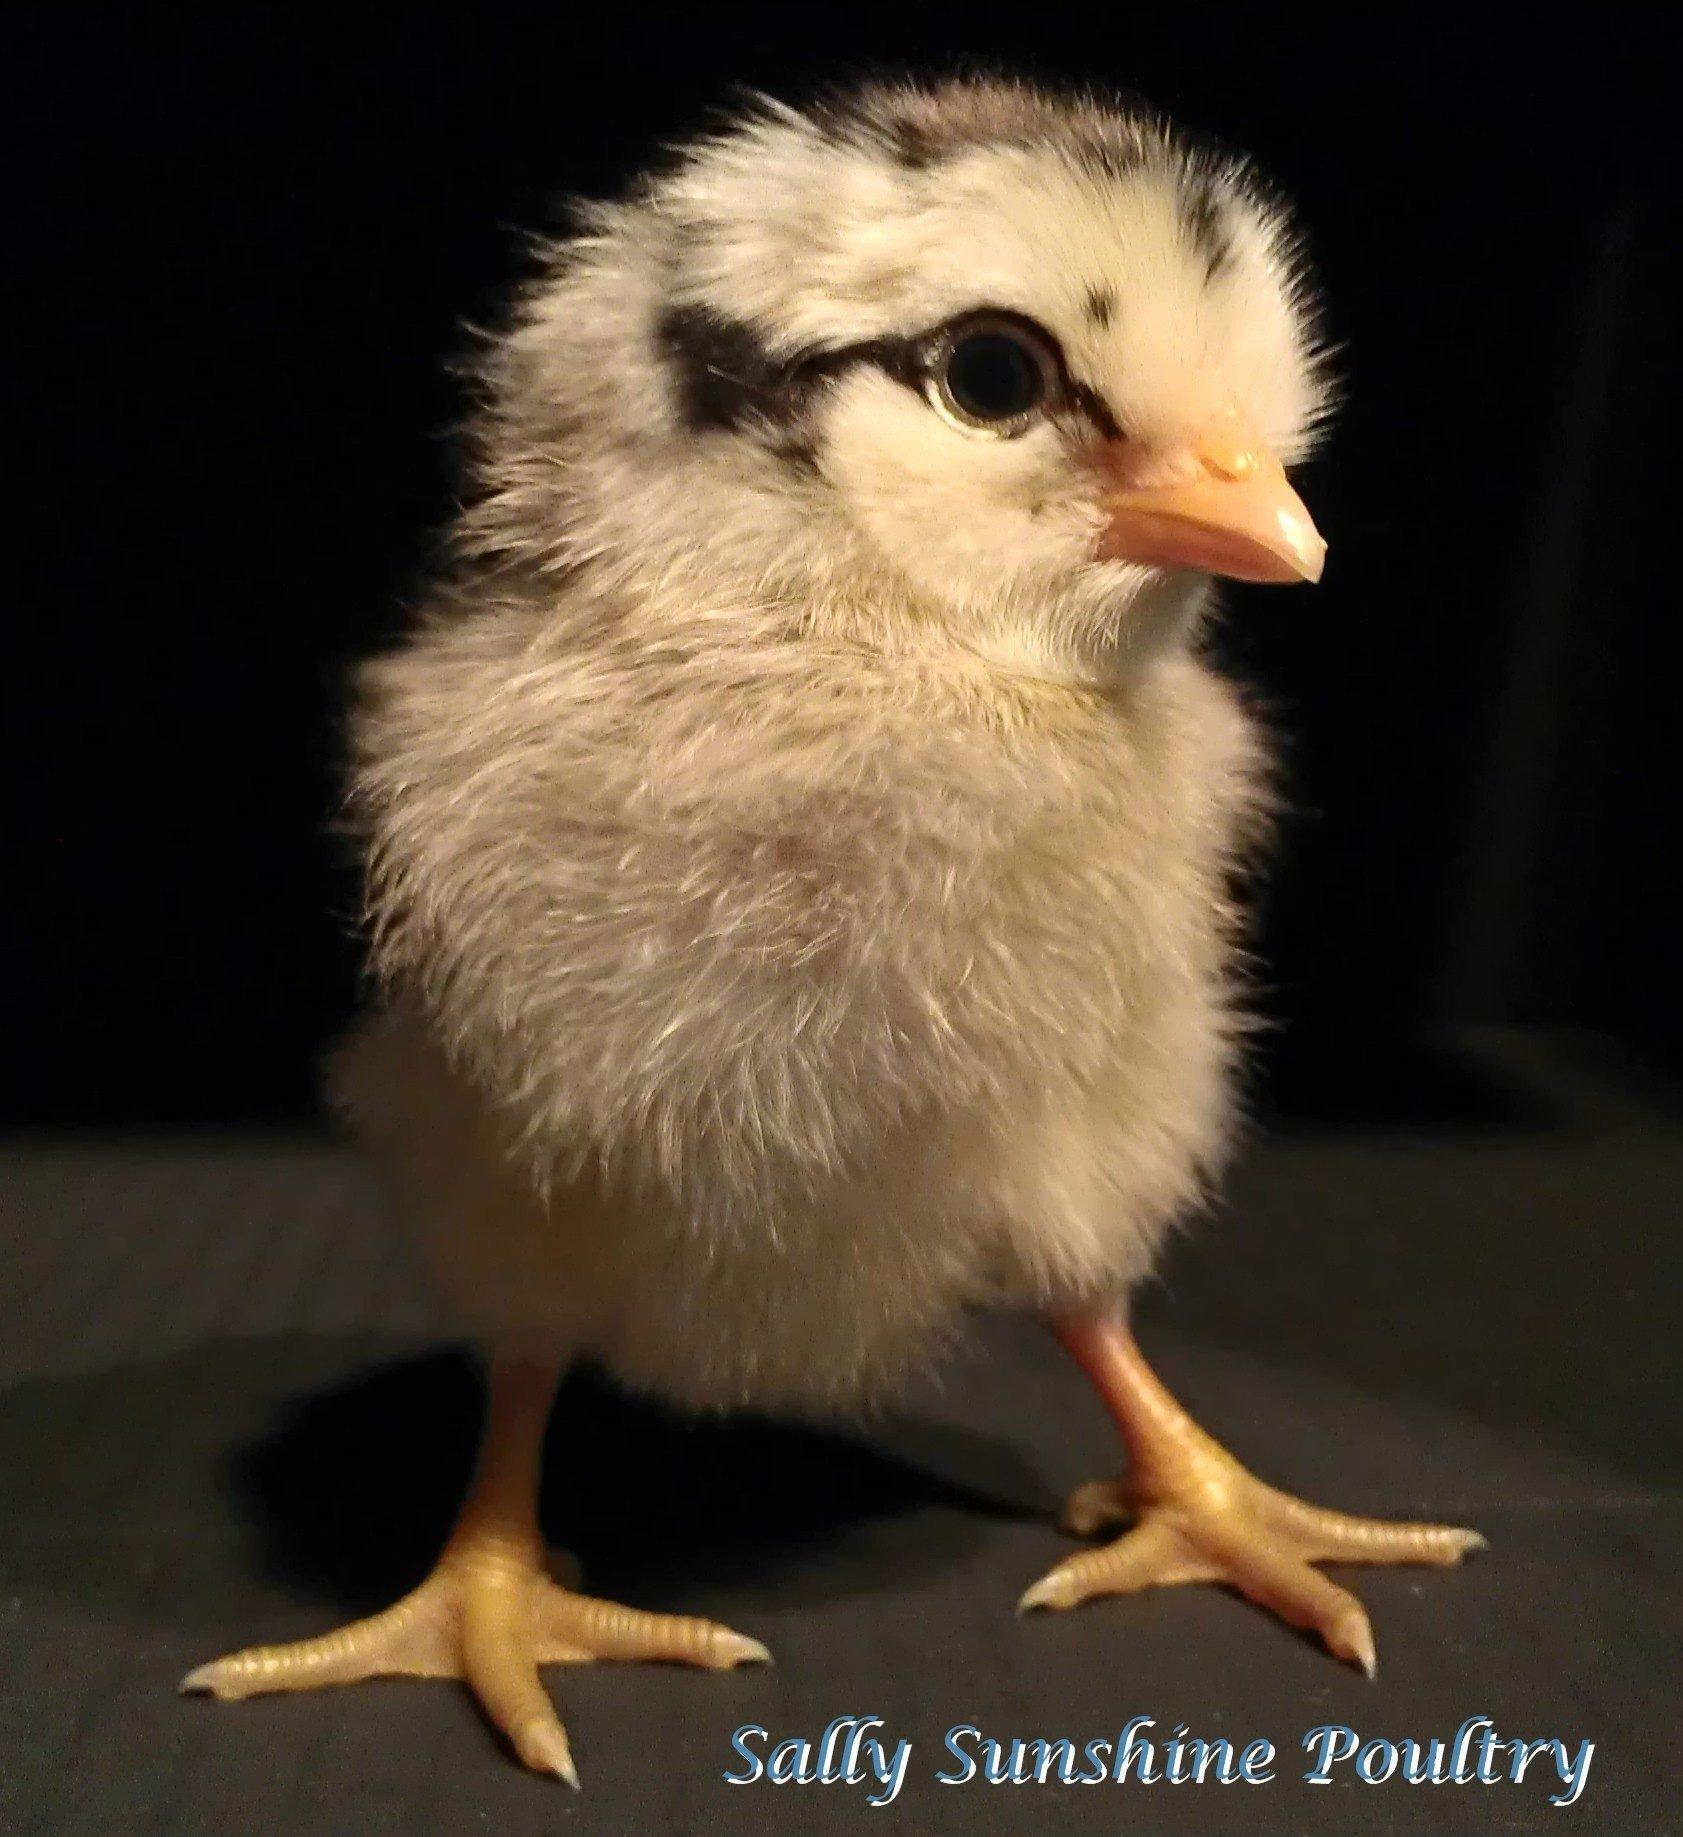 share helpful backyard poultry tips u201d a random posting contest